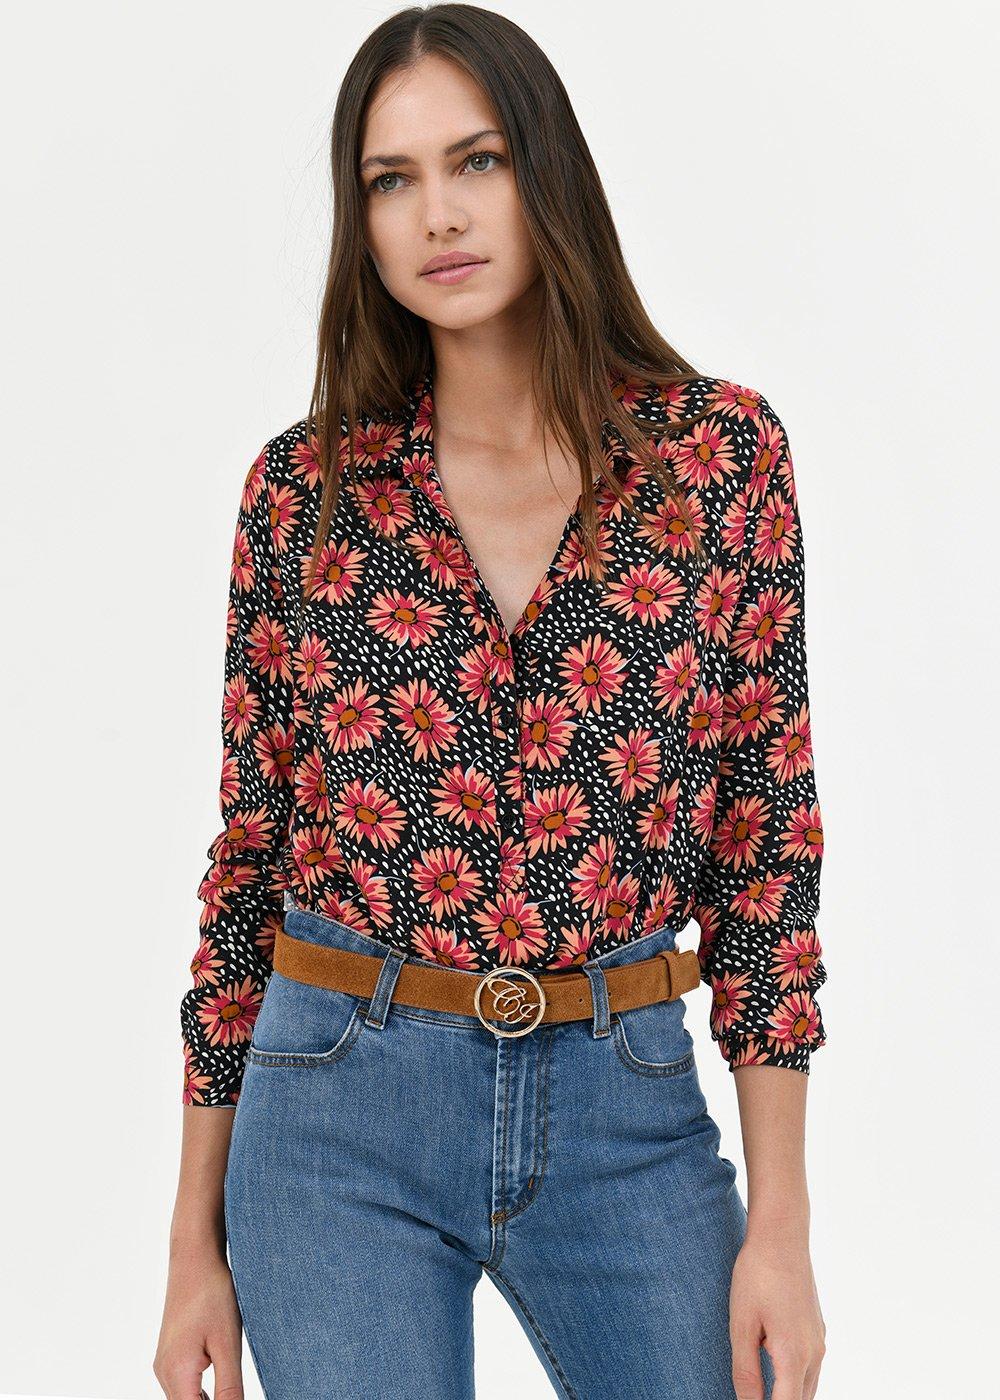 Camilla shirt with daisy print - Black /  Pink Multi - Woman